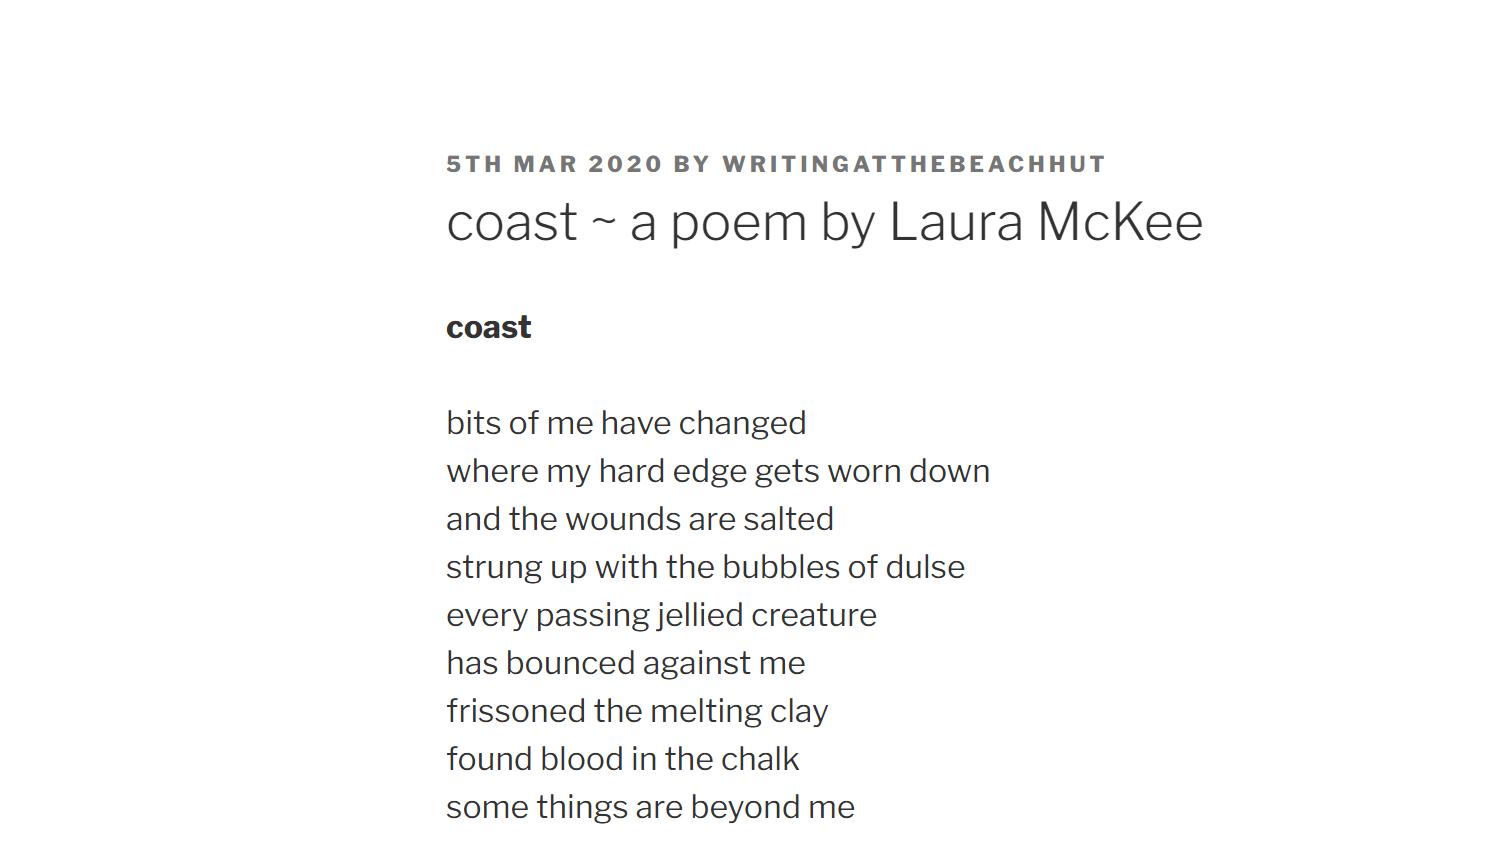 coast by laura McKee